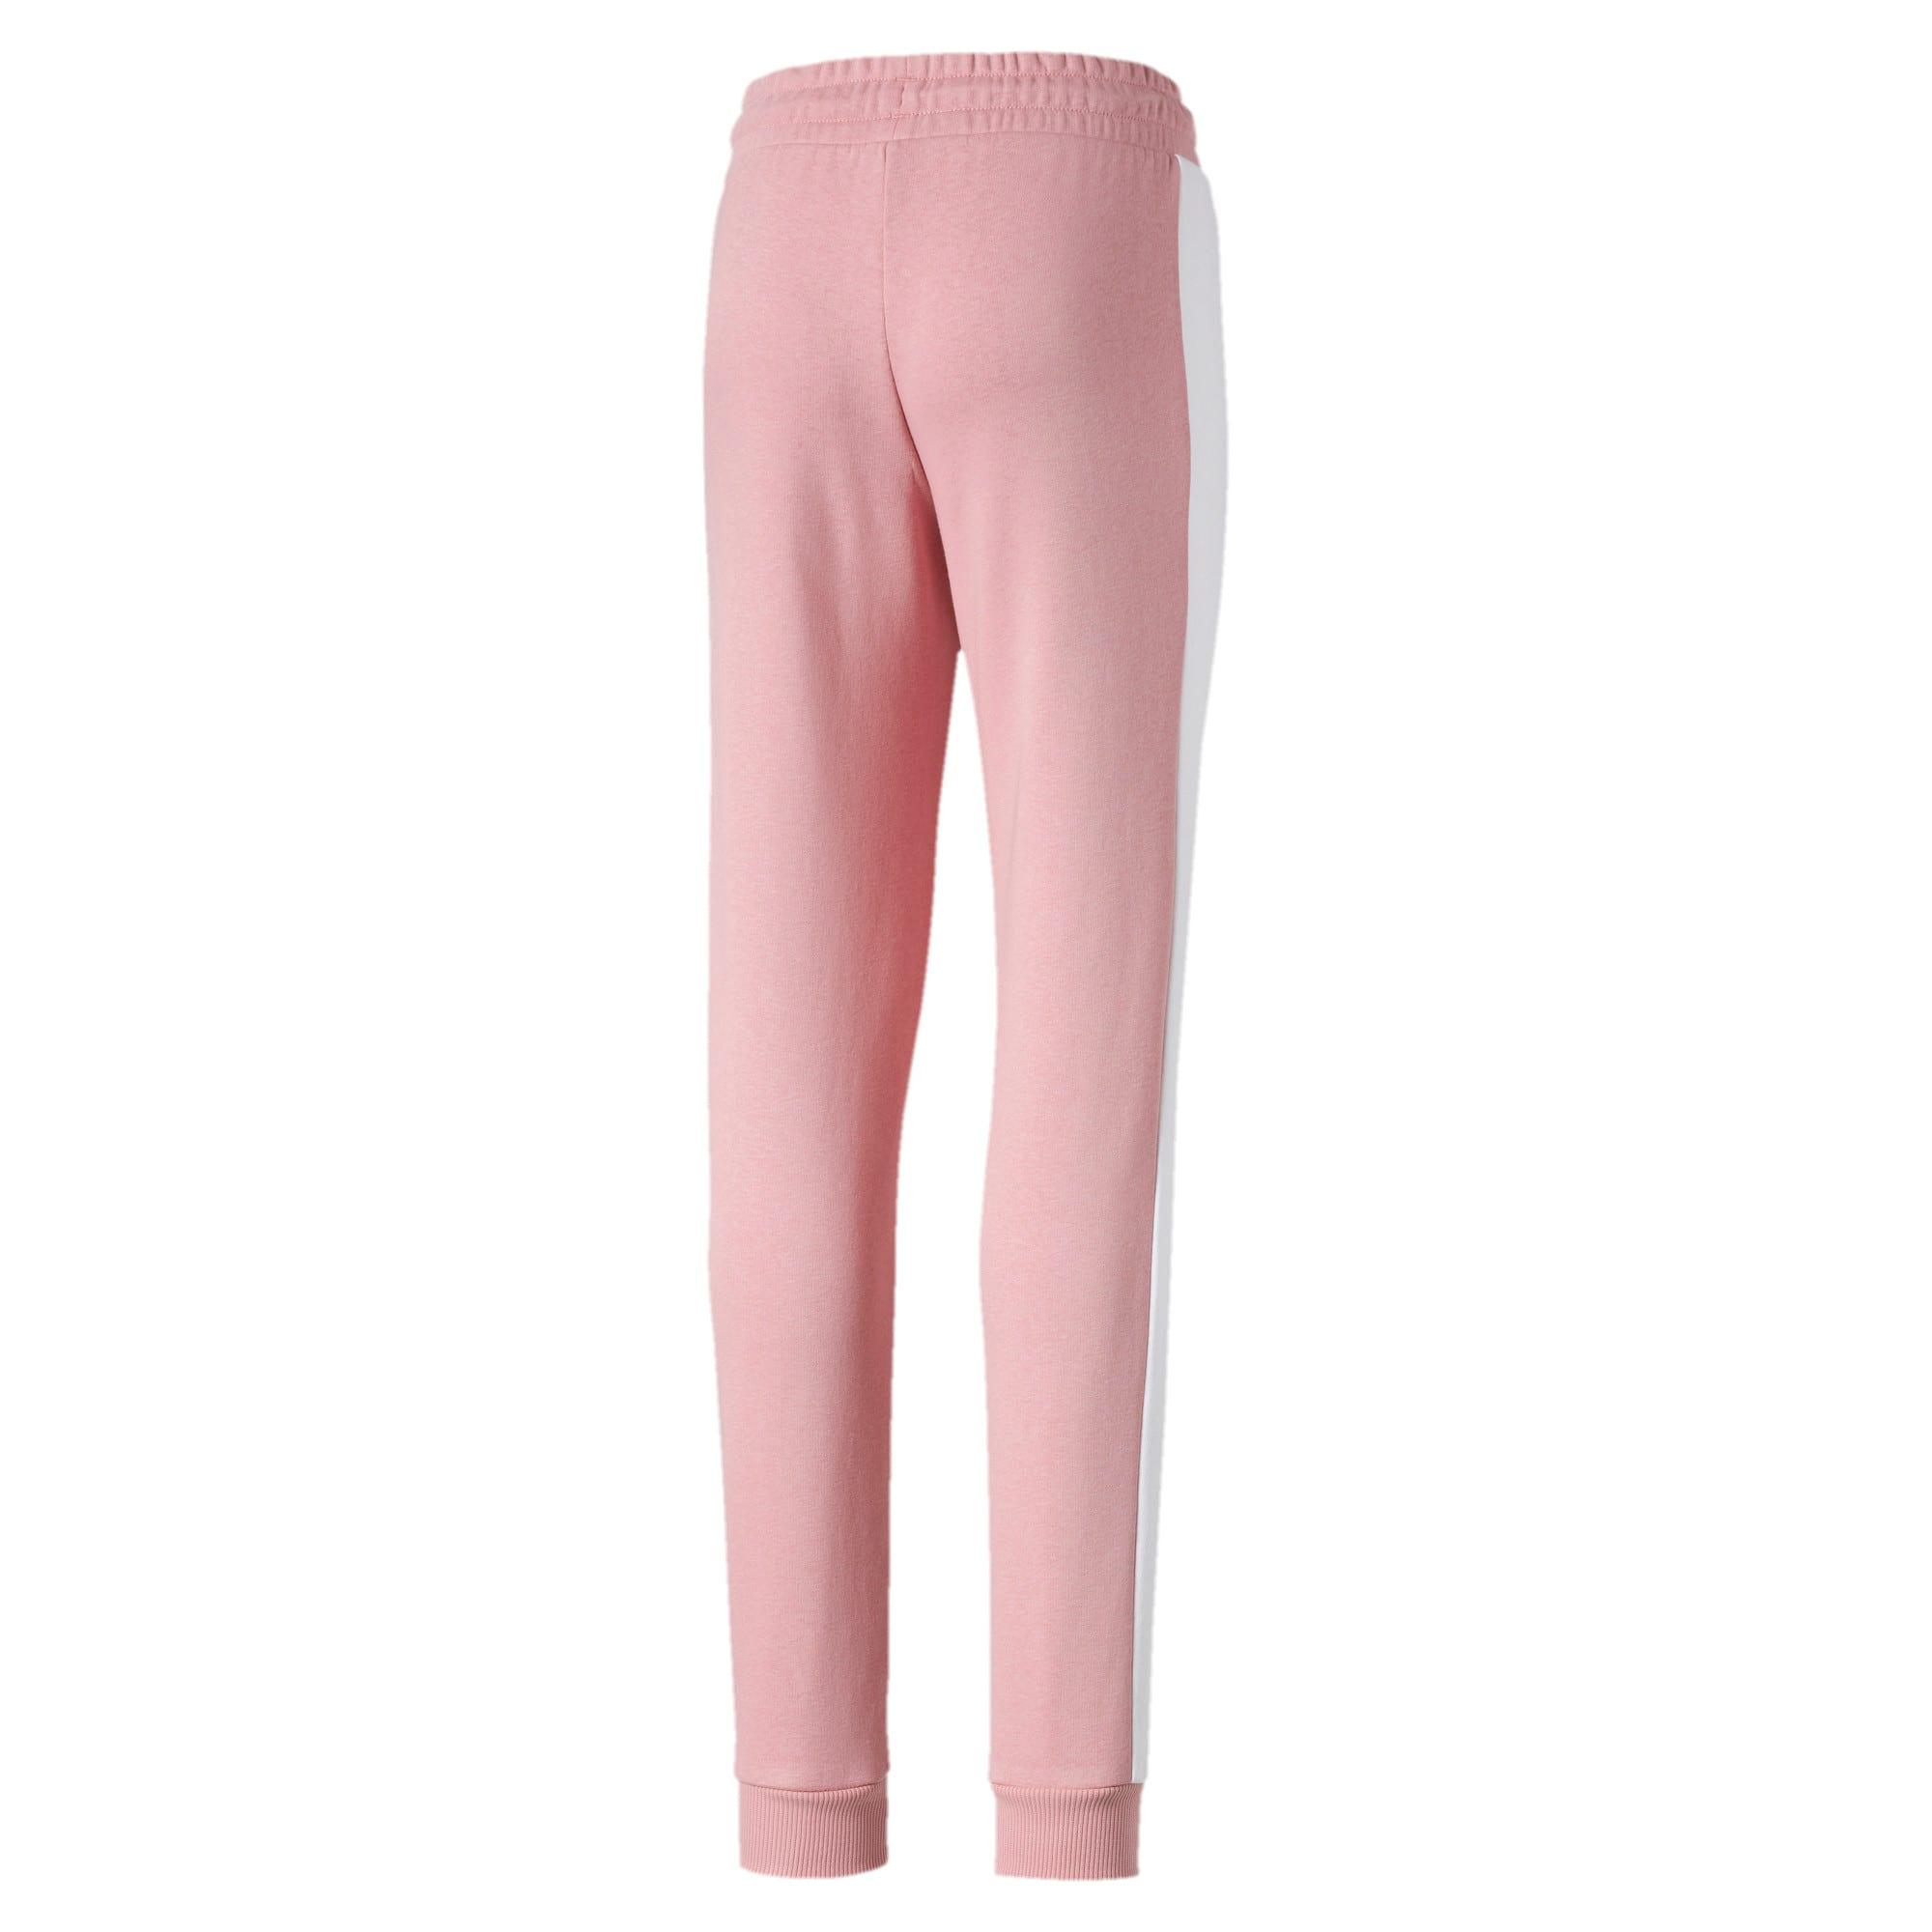 Thumbnail 2 of Classics T7 Knitted Girls' Sweatpants, Bridal Rose, medium-IND